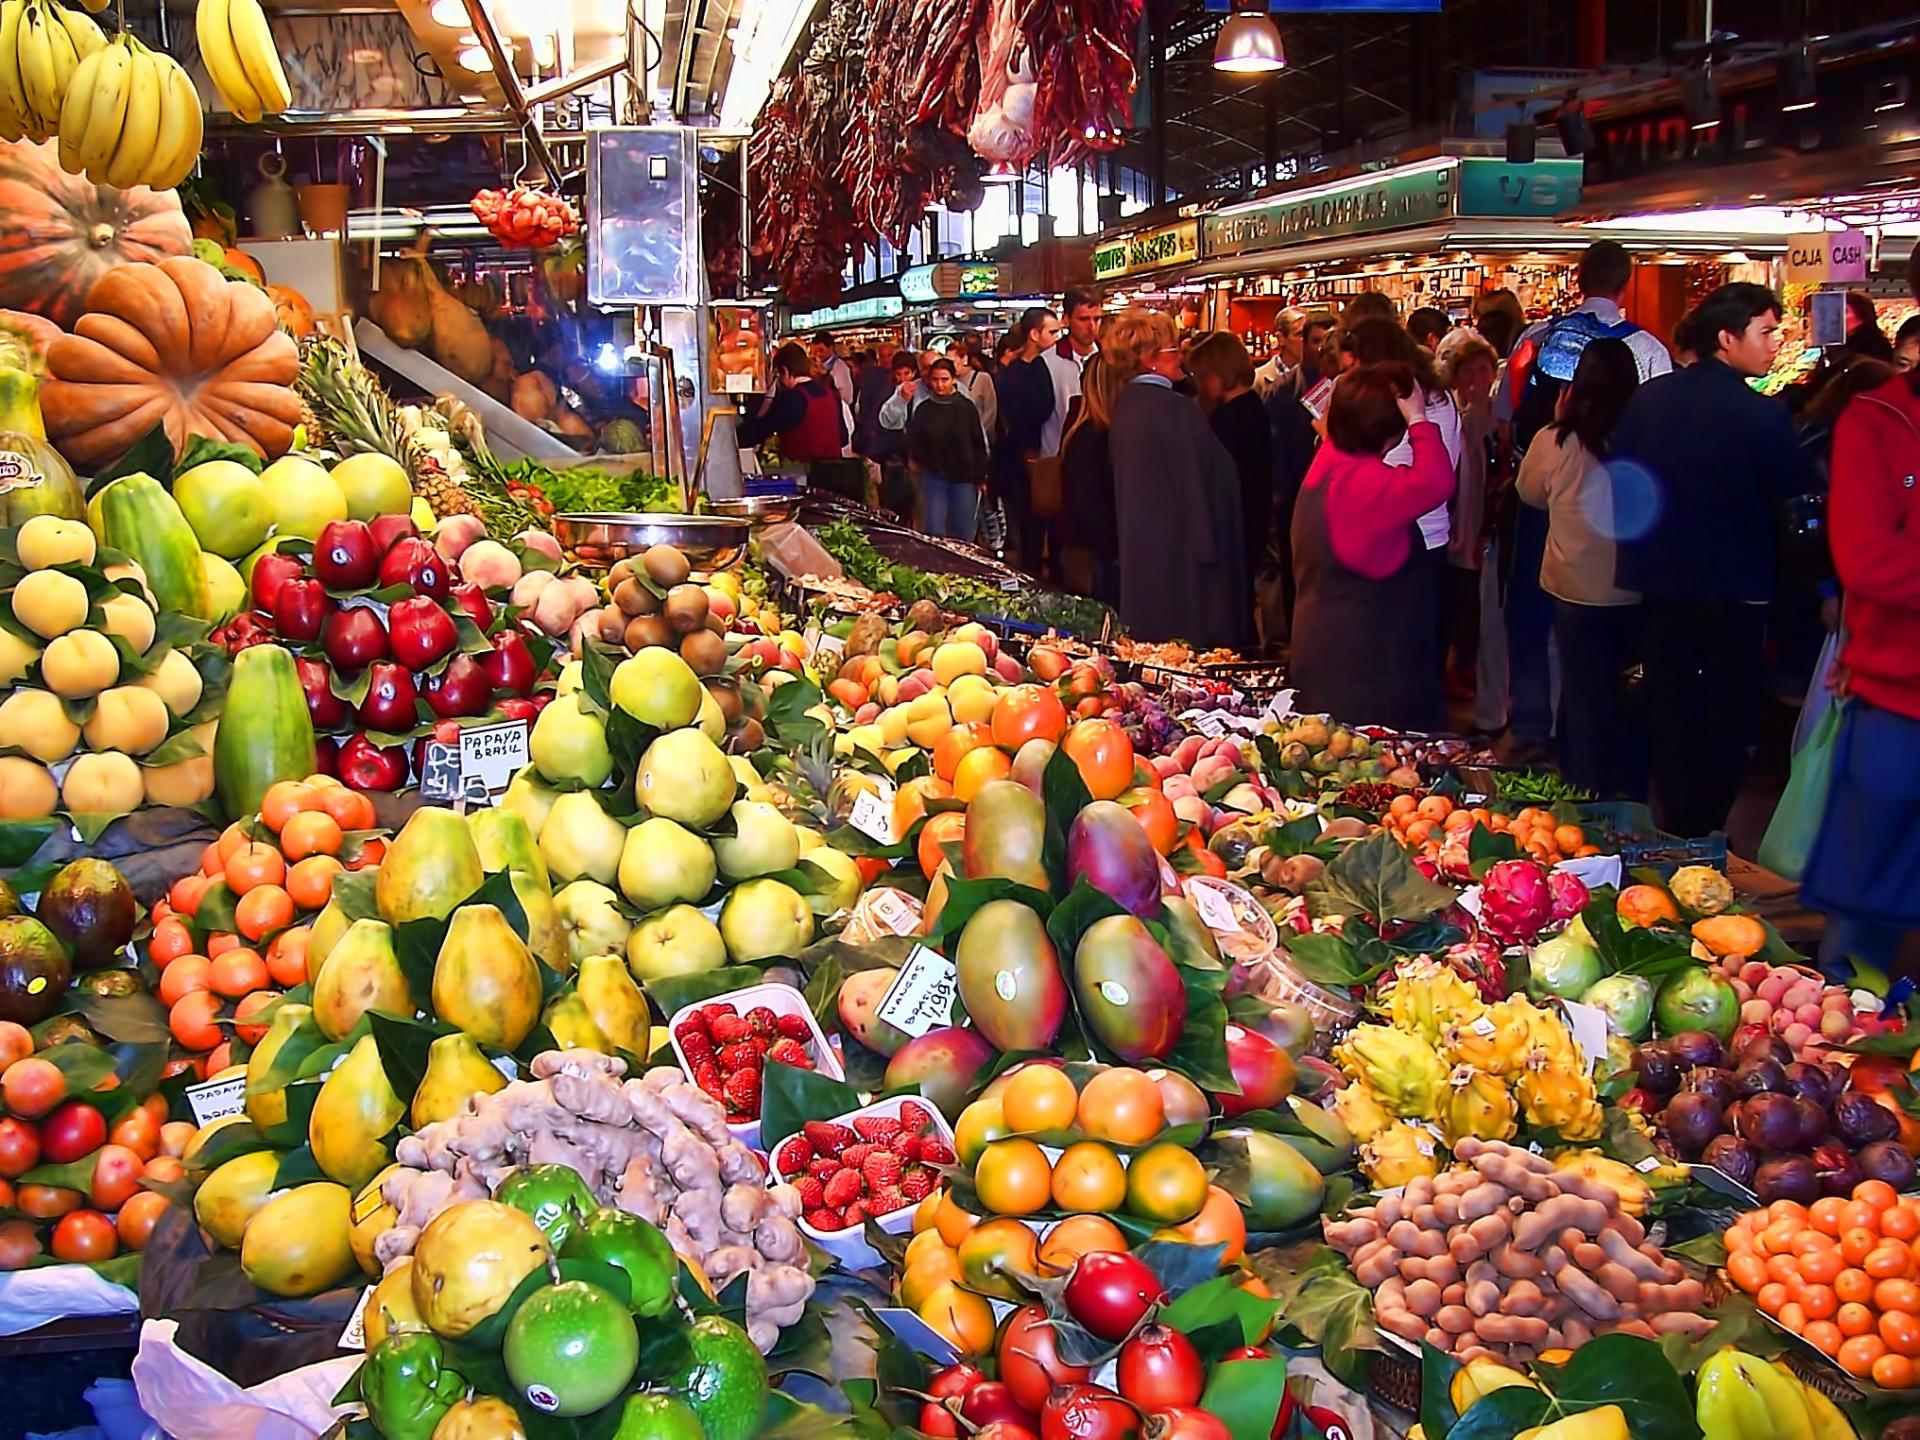 National Fresh Fruit and Vegetables Month, Farmers Market, Fruits, Vegetables